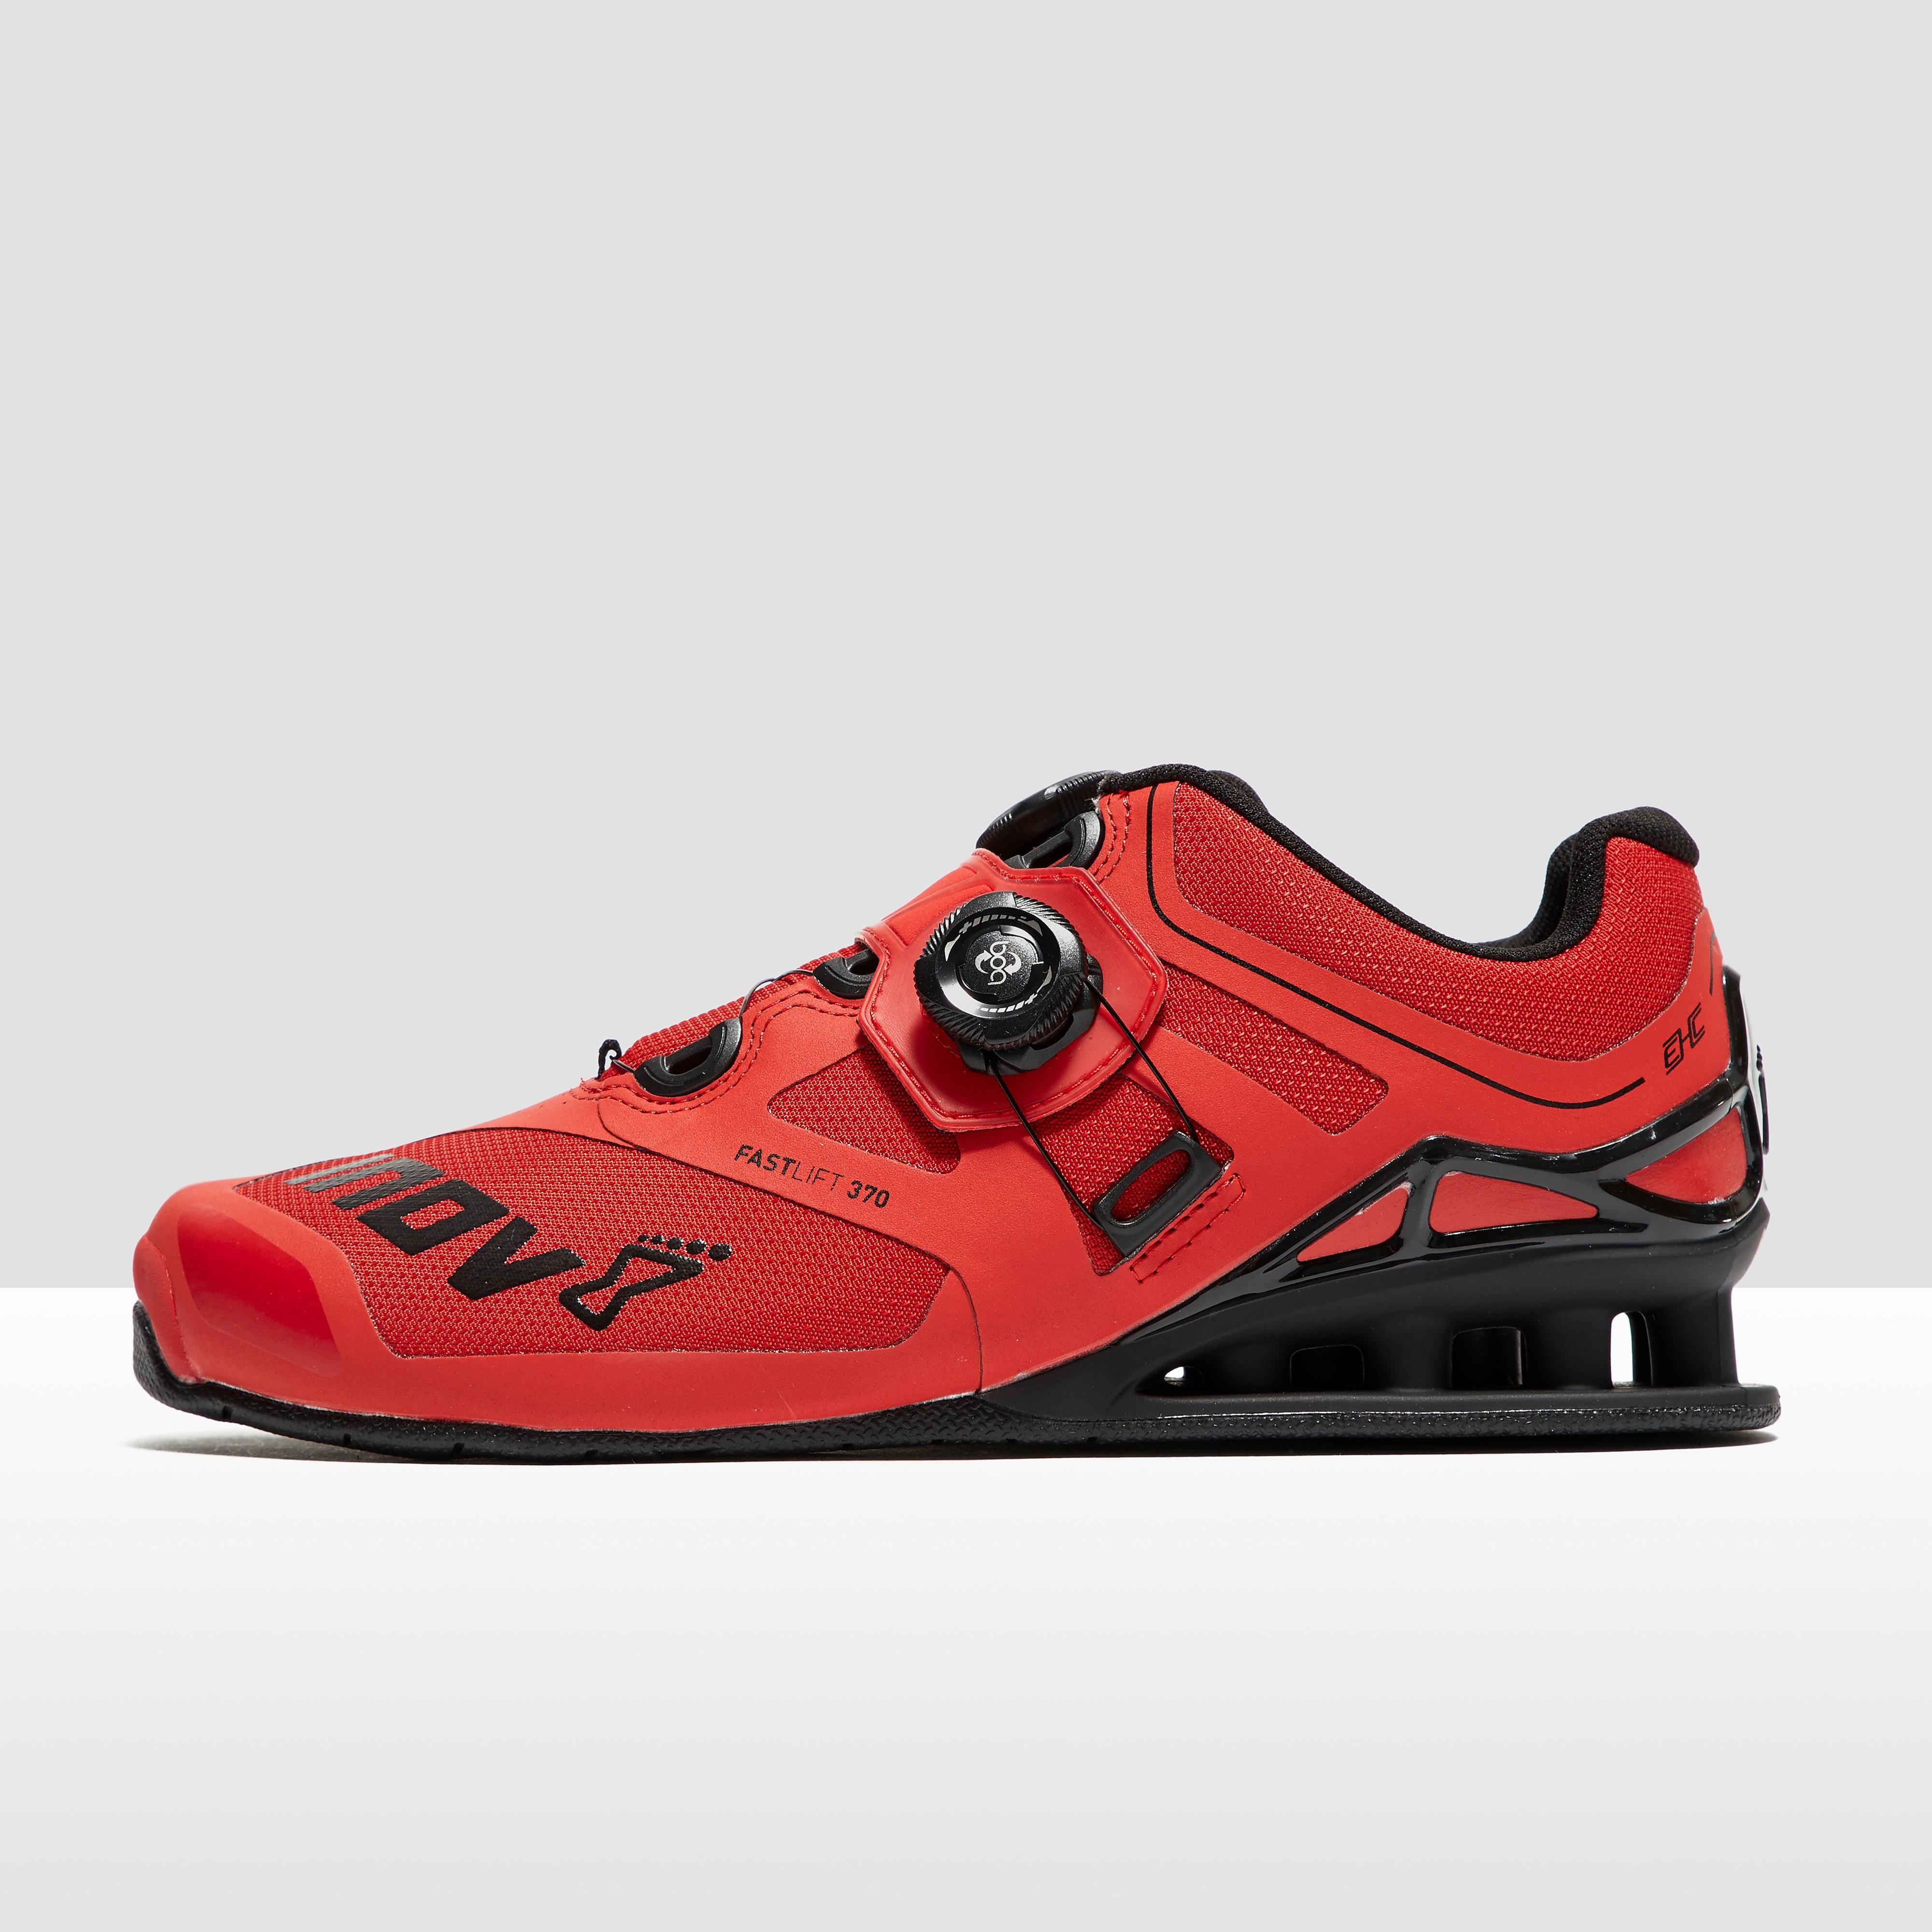 Inov-8 Fast Lift 370 BOA Men's Training Shoes